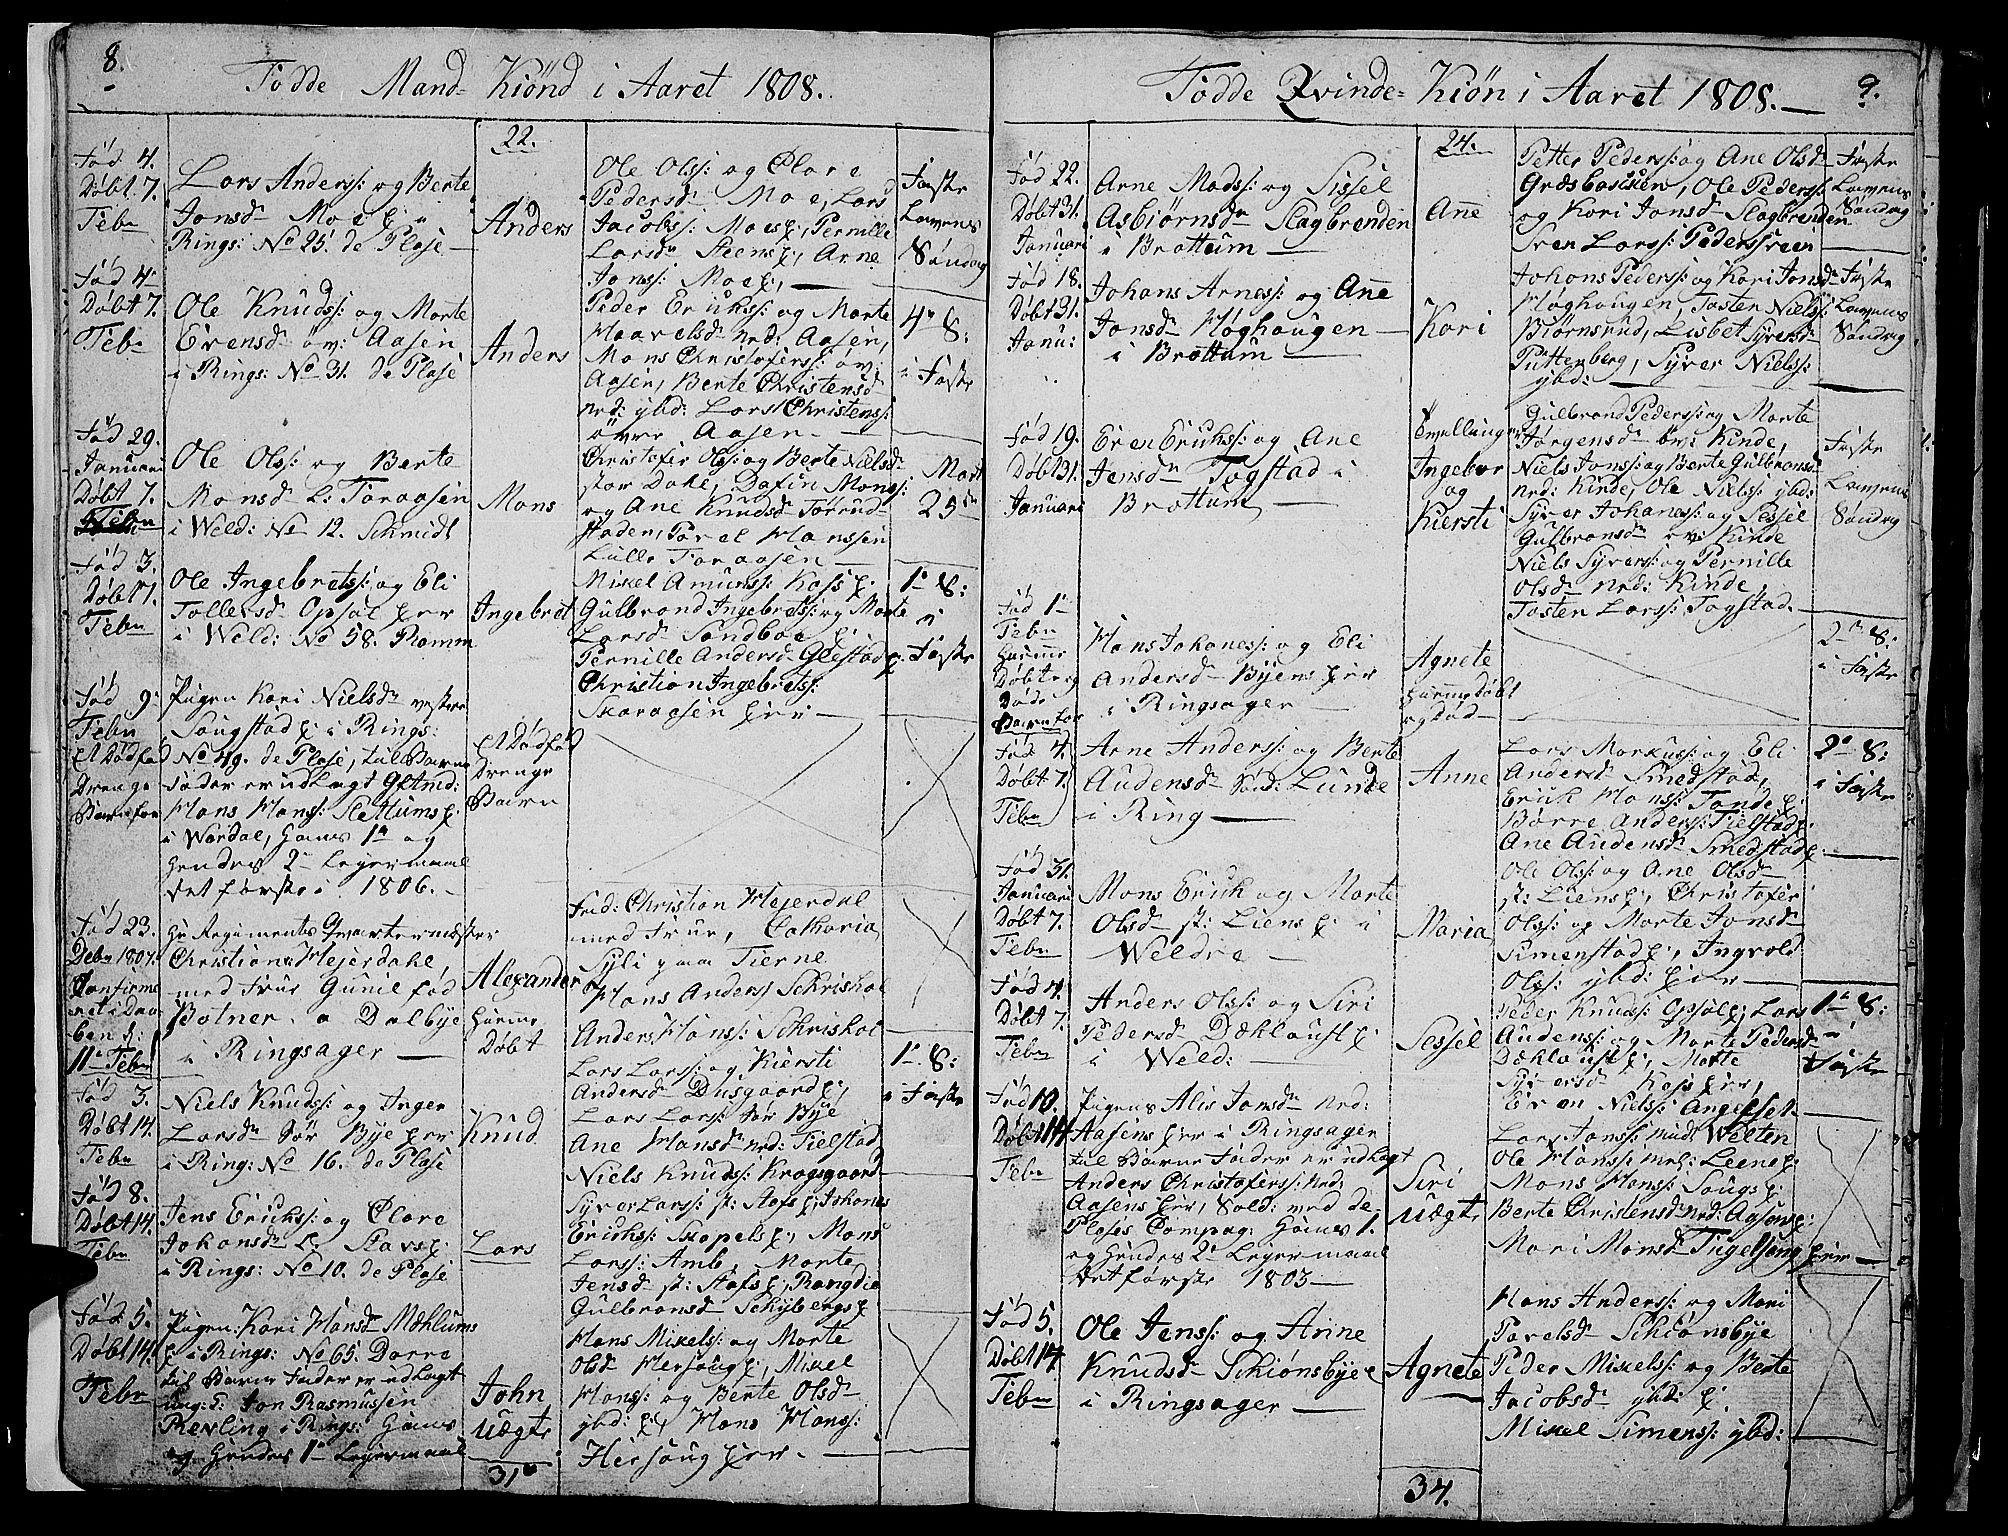 SAH, Ringsaker prestekontor, I/Ia/L0005/0008: Kladd til kirkebok nr. 1H, 1807-1811, s. 8-9